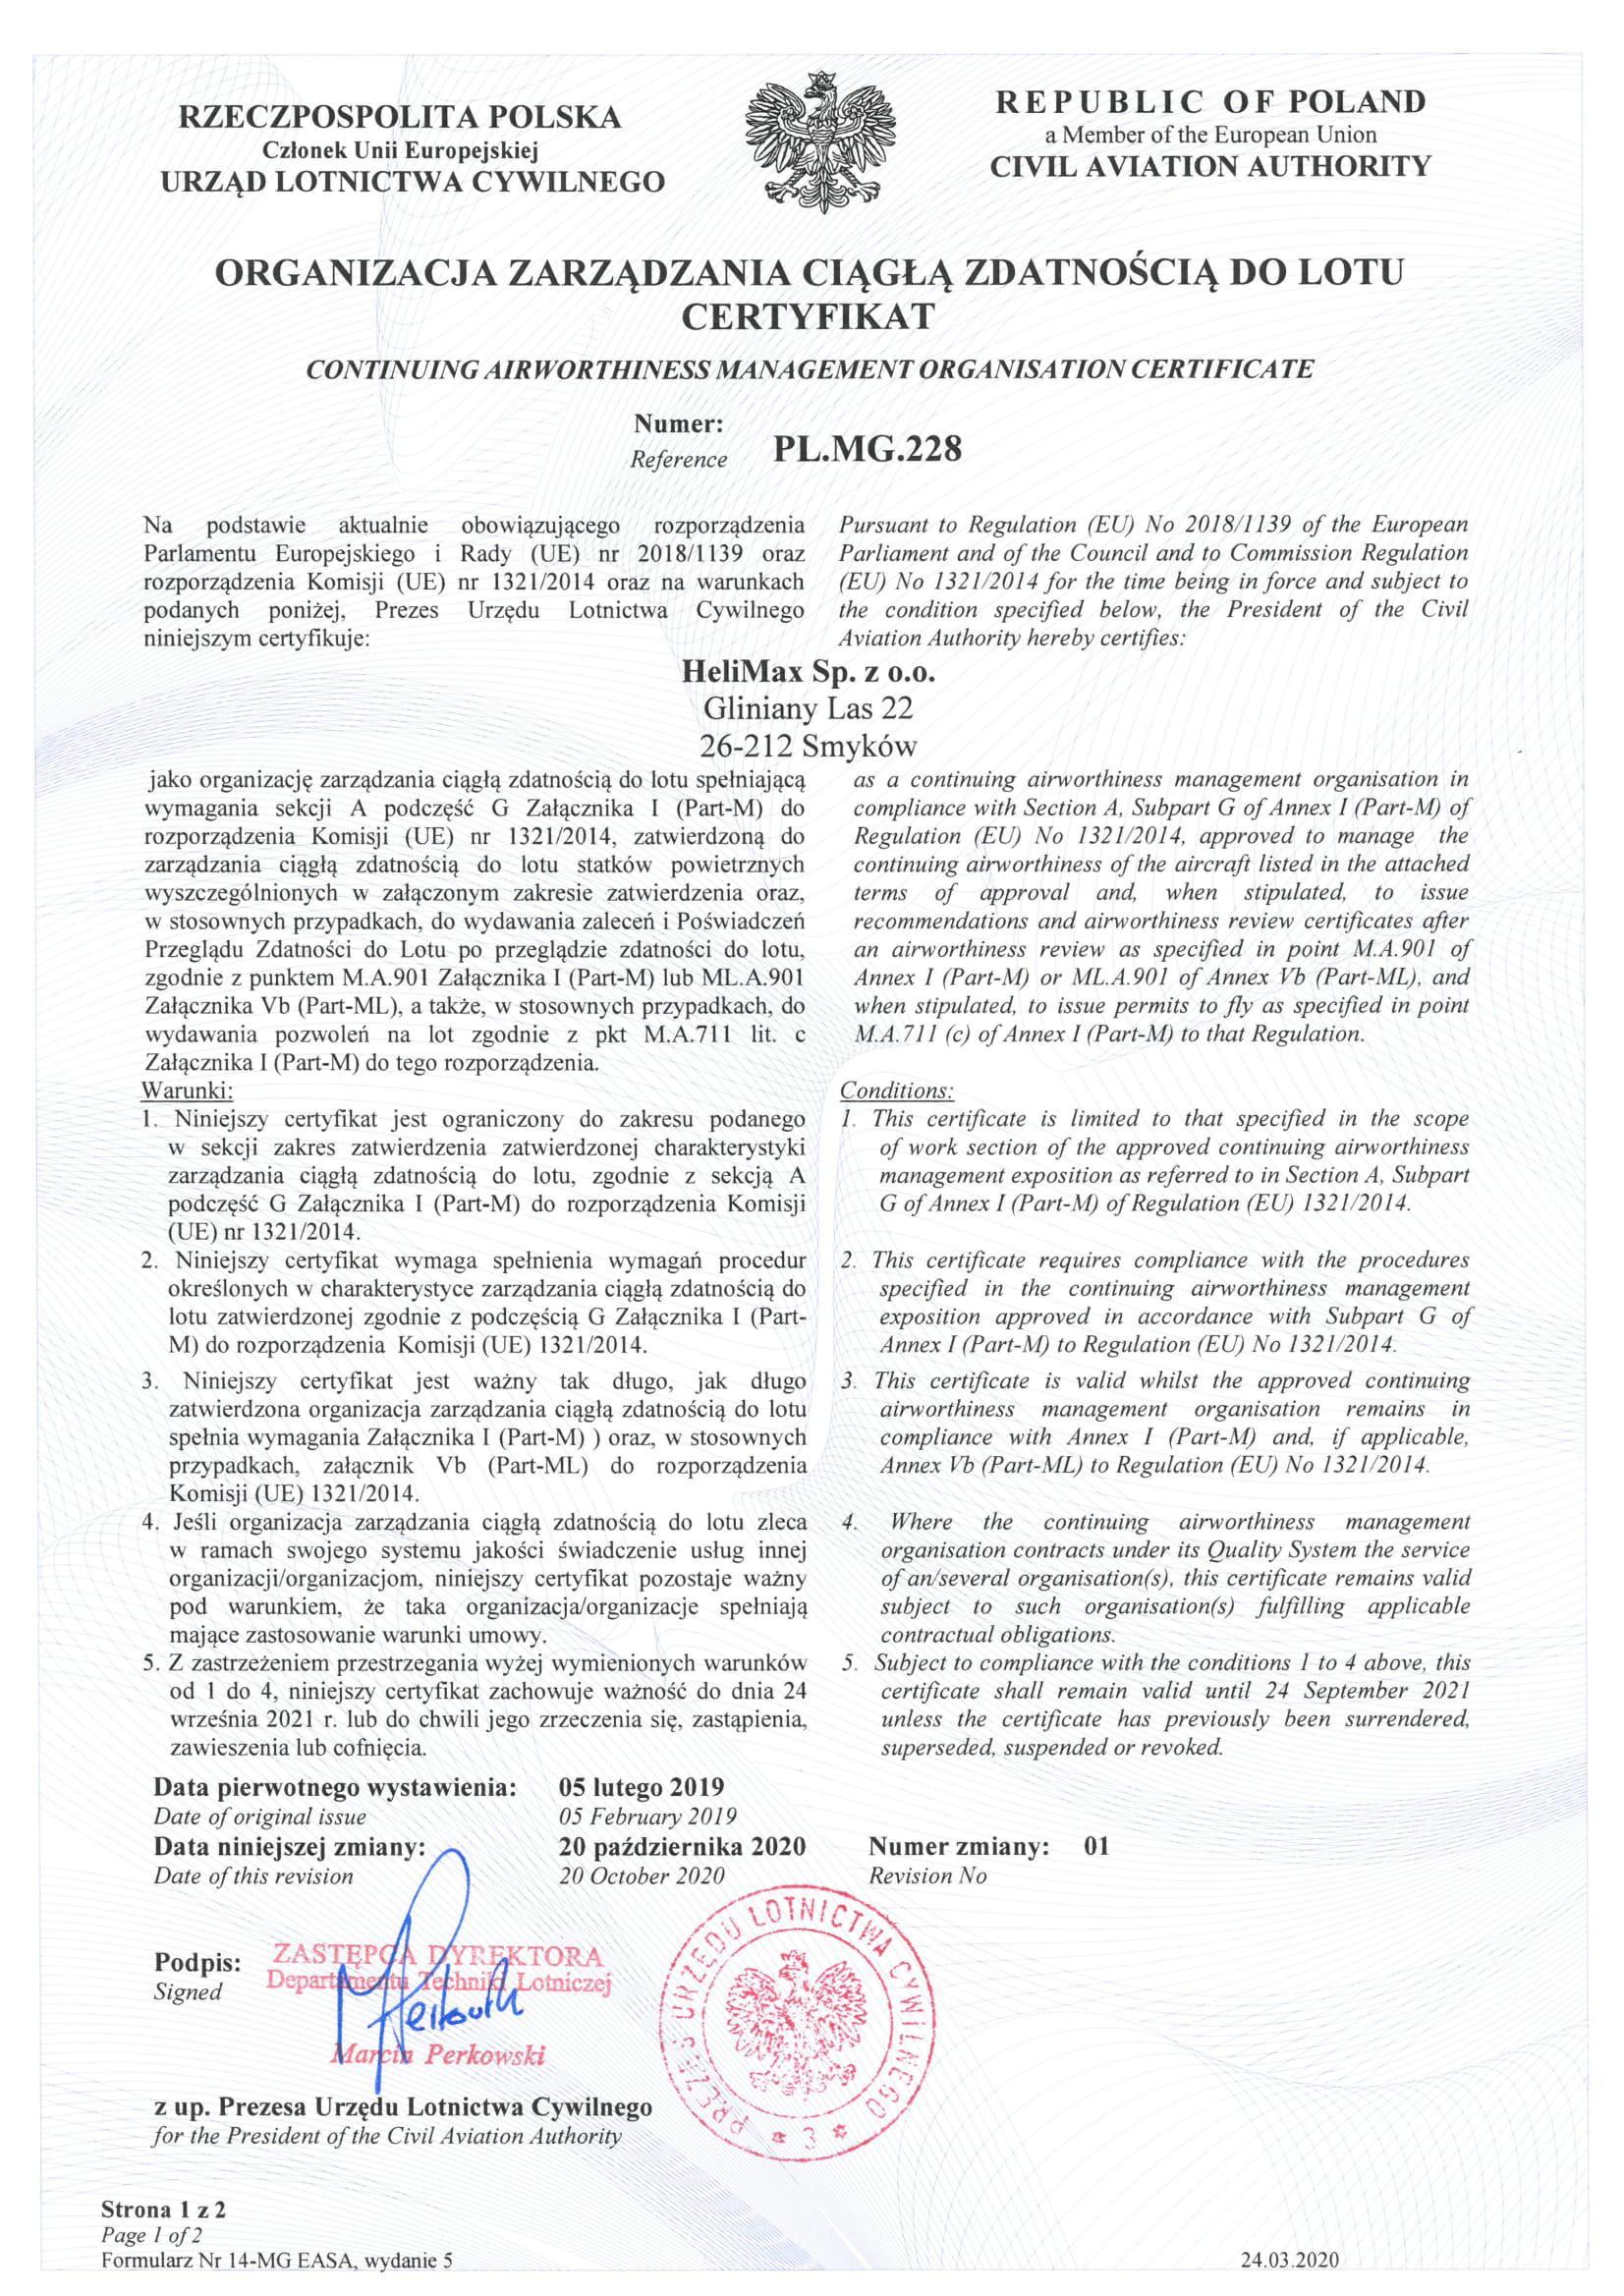 CAMO_certyfikat-1